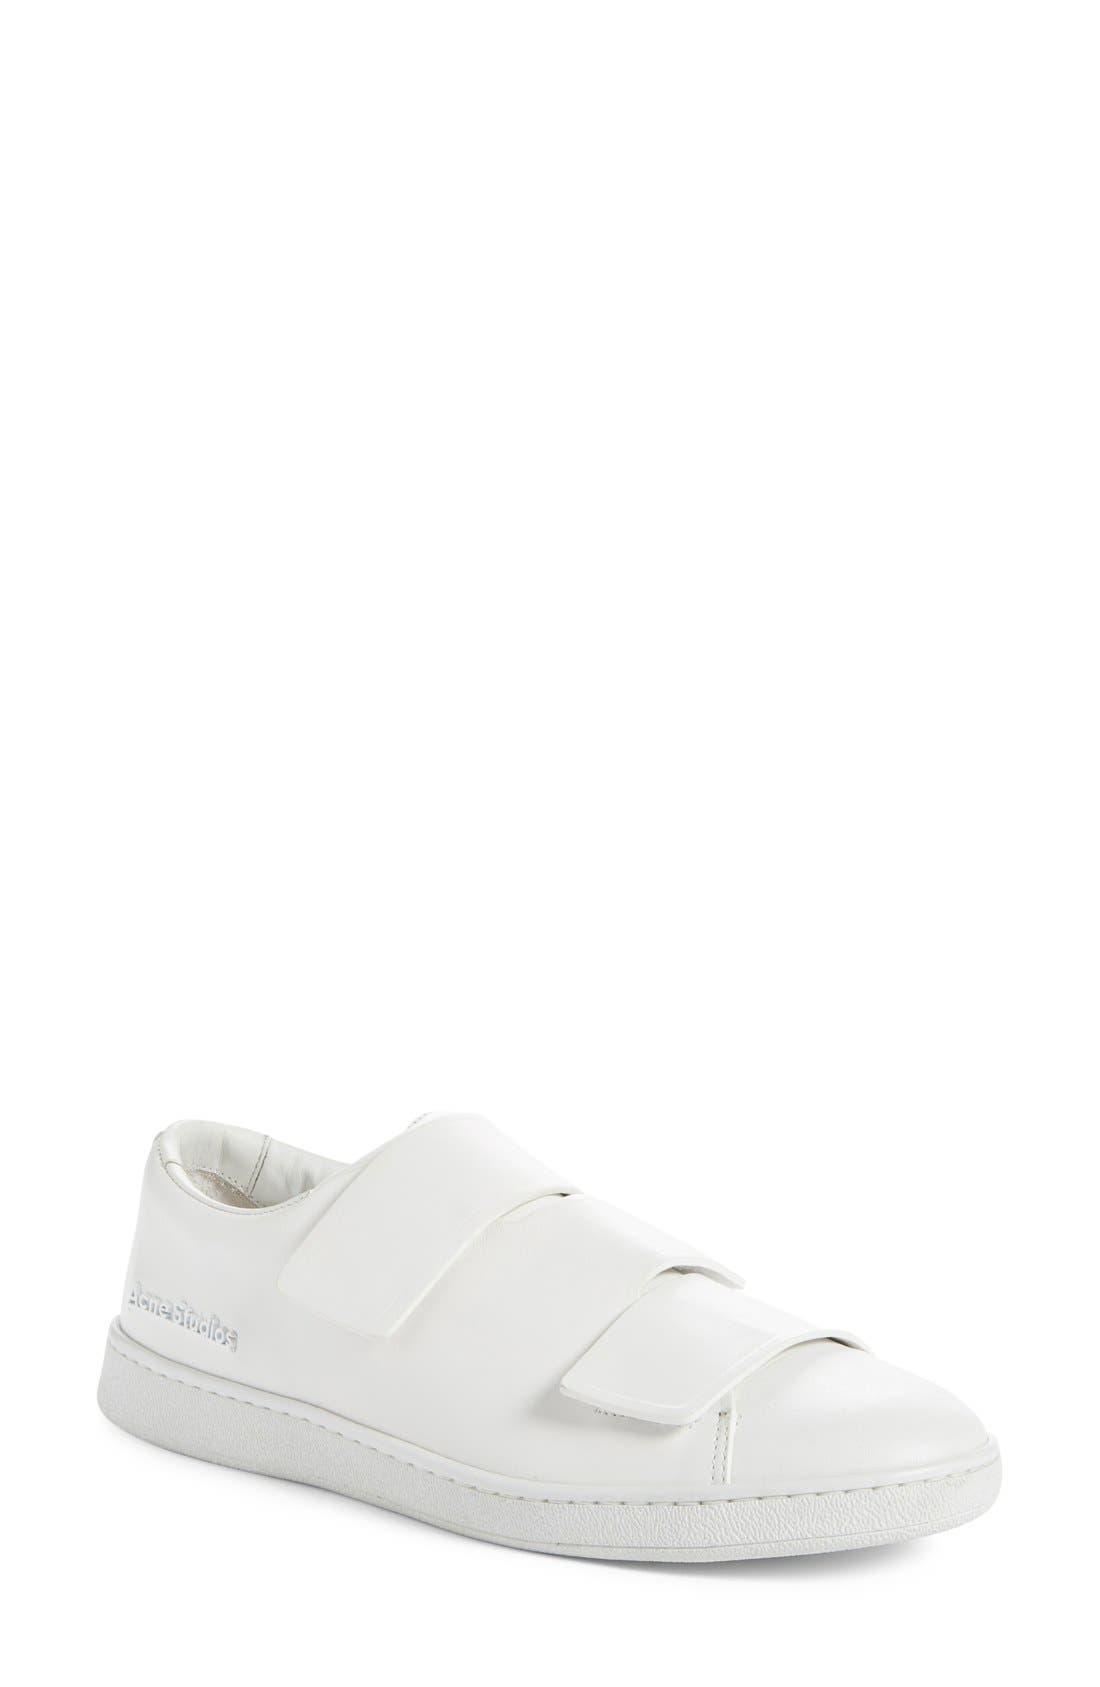 Alternate Image 1 Selected - Acne Studios Triple Strap Sneaker (Women)